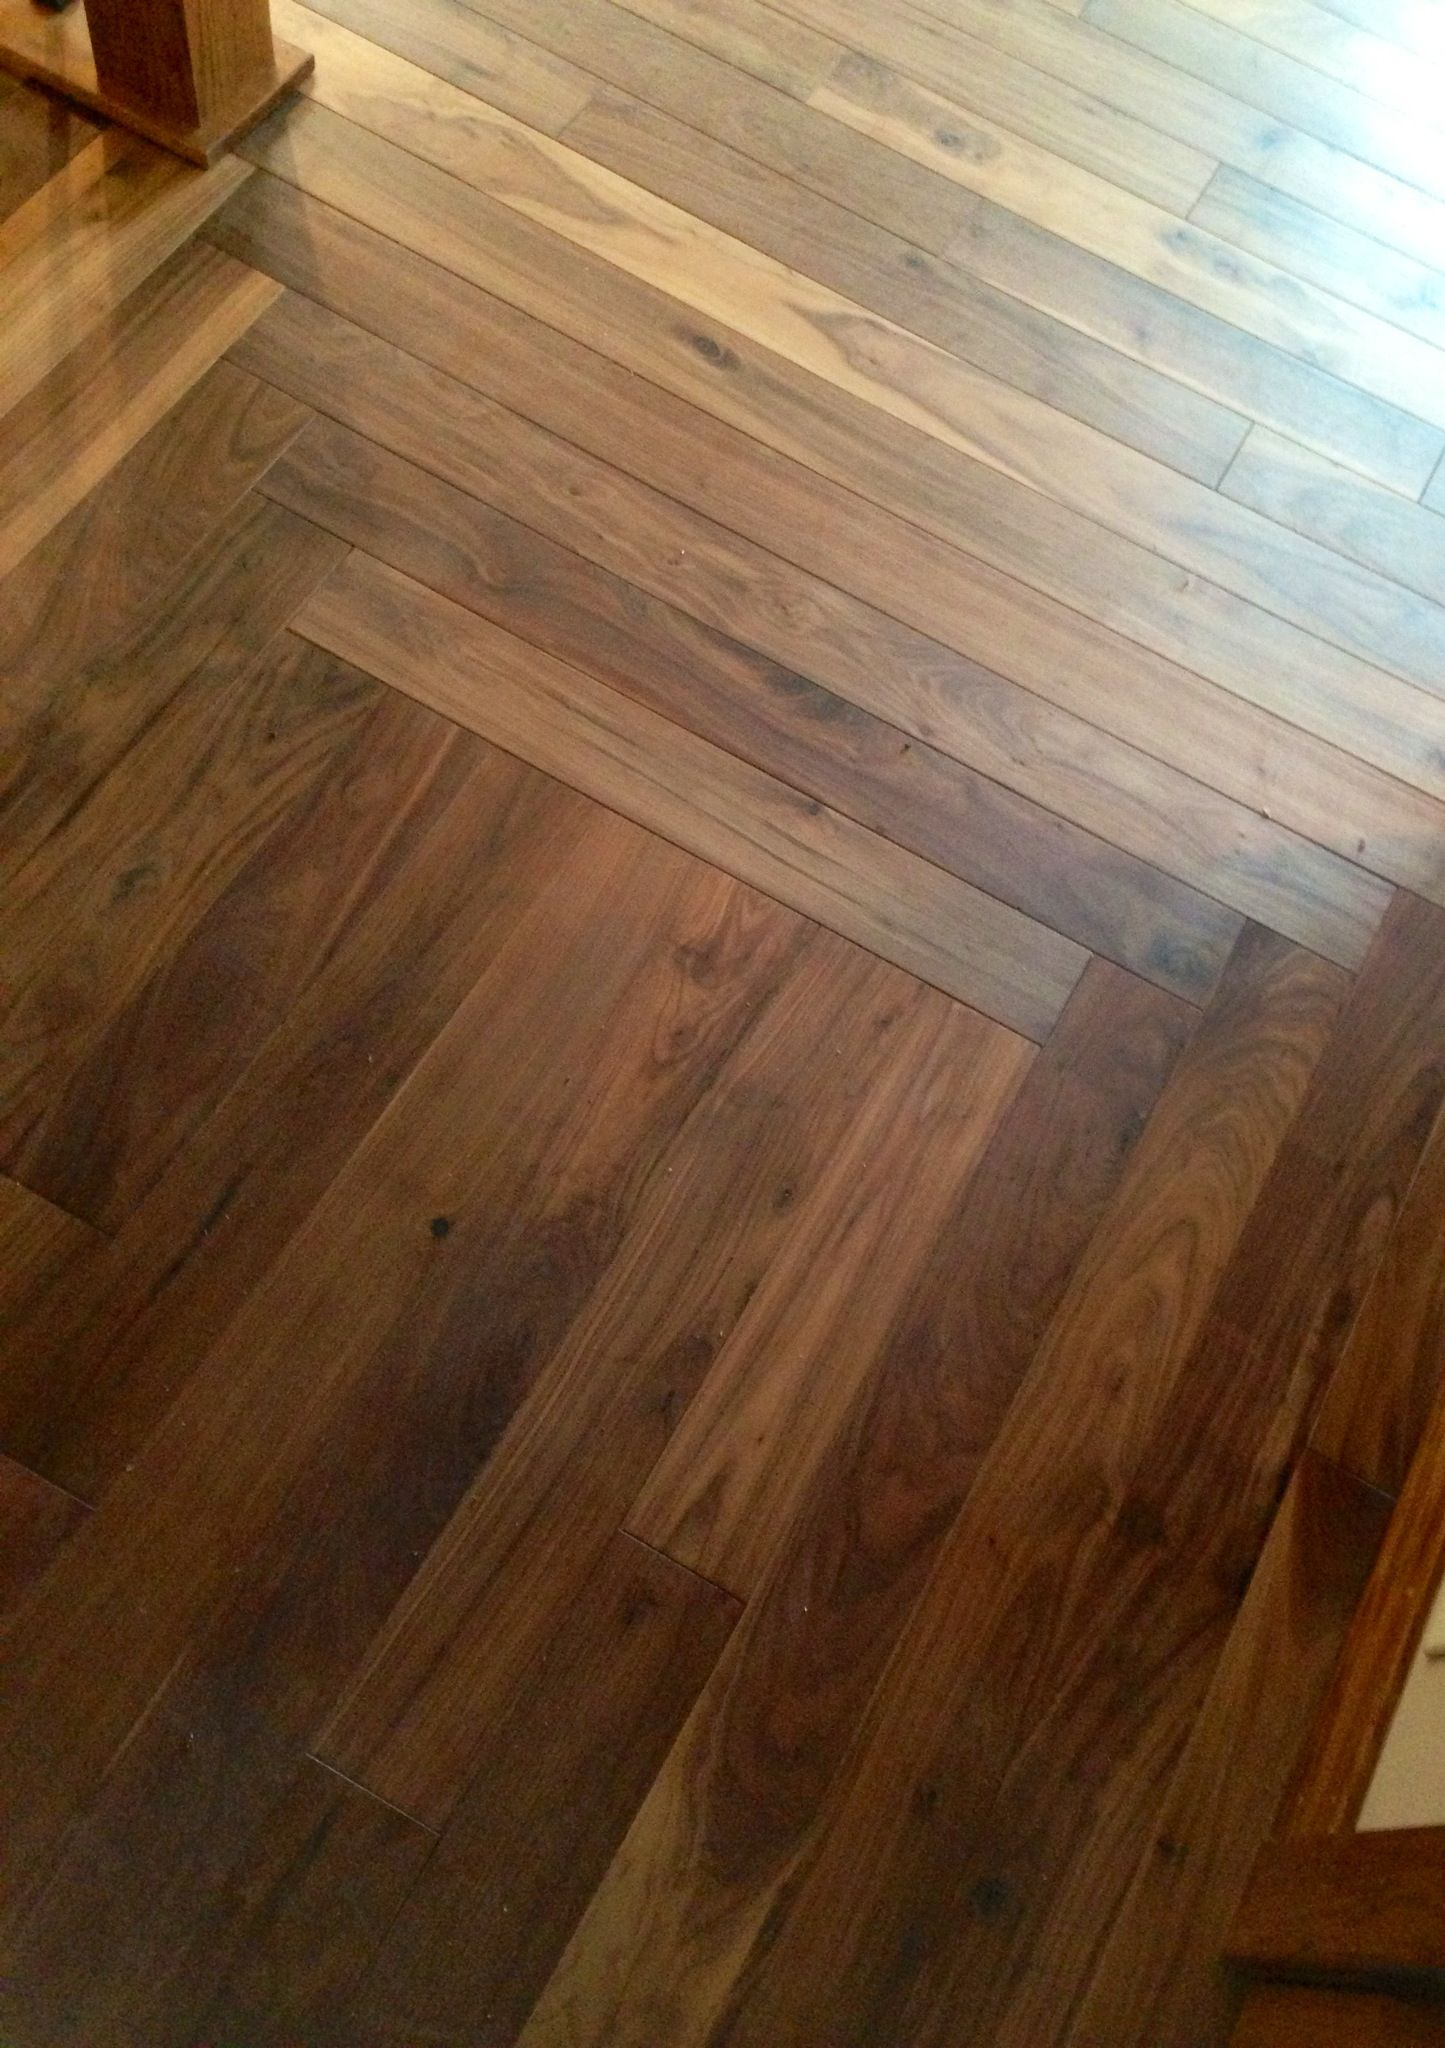 Walnut Flooring From The W D Flooring Stang Lund Collection Forde Engineered Wood Floors Hardwood Floors Floor Restoration